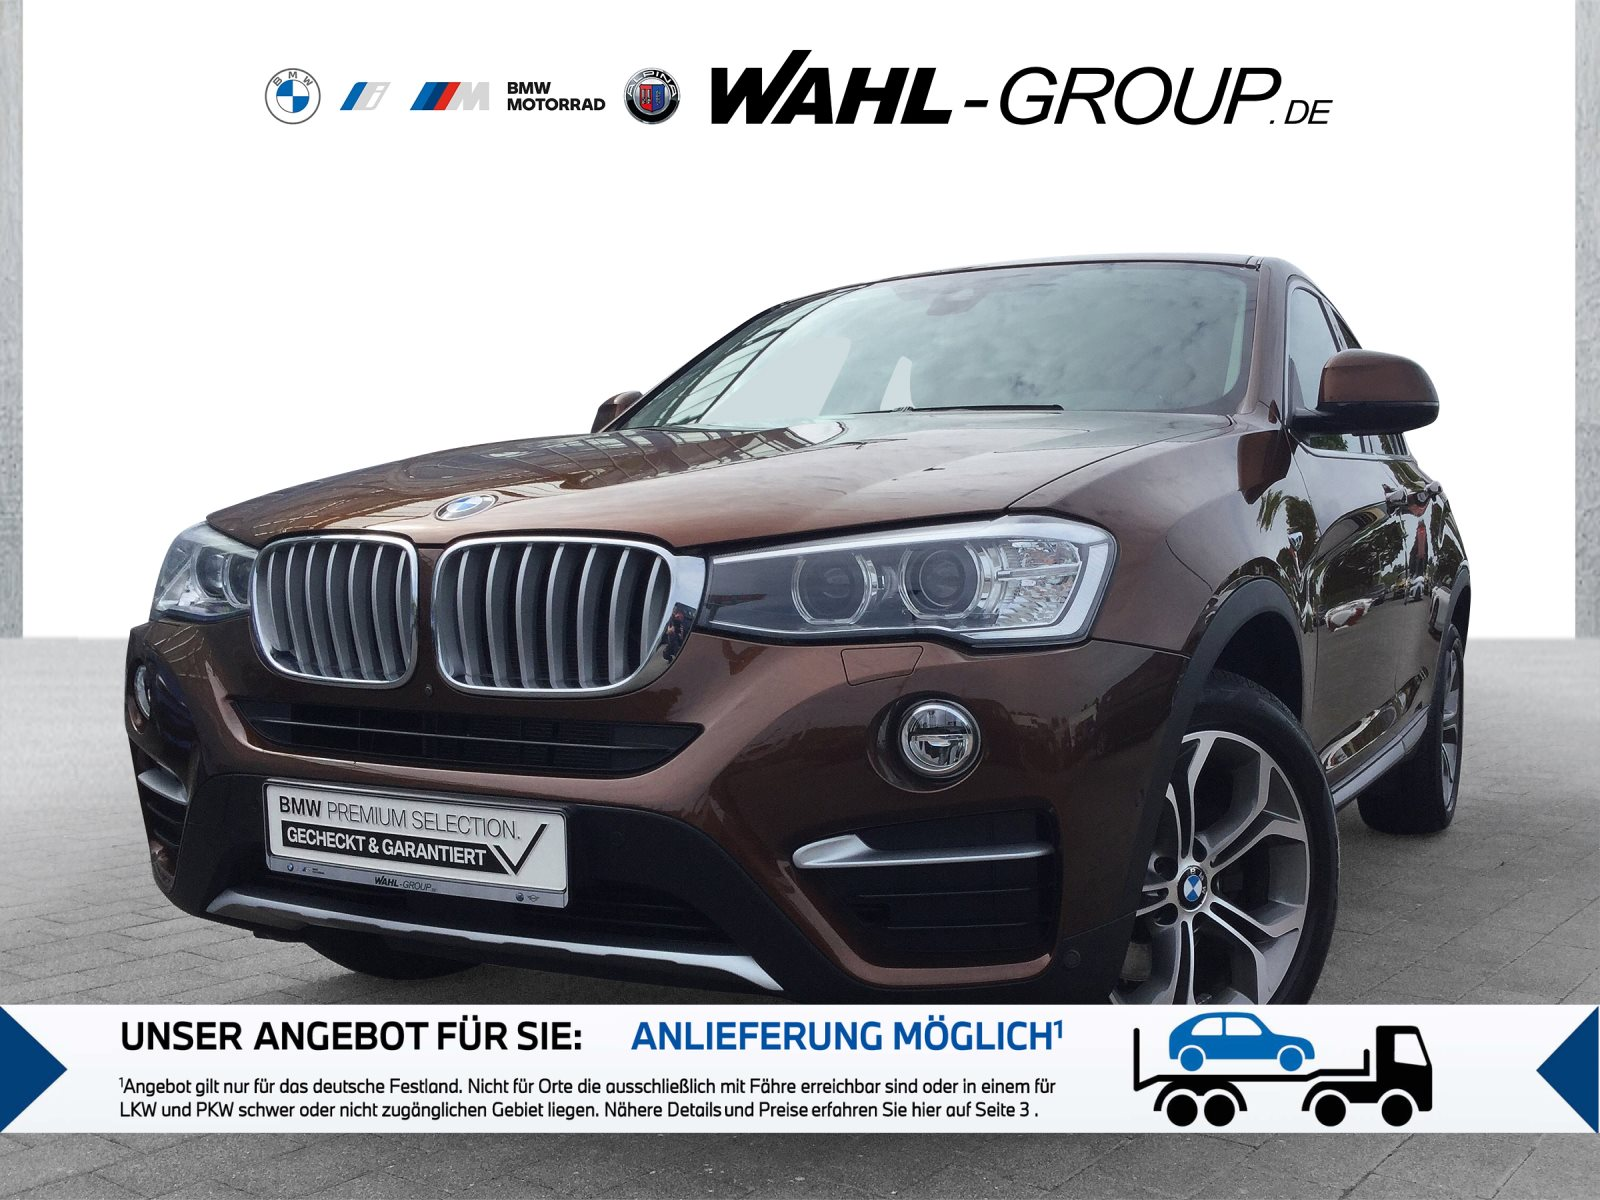 BMW X4 xDrive30d xLine Leder Navi Prof. AHK LM 18, Jahr 2018, Diesel